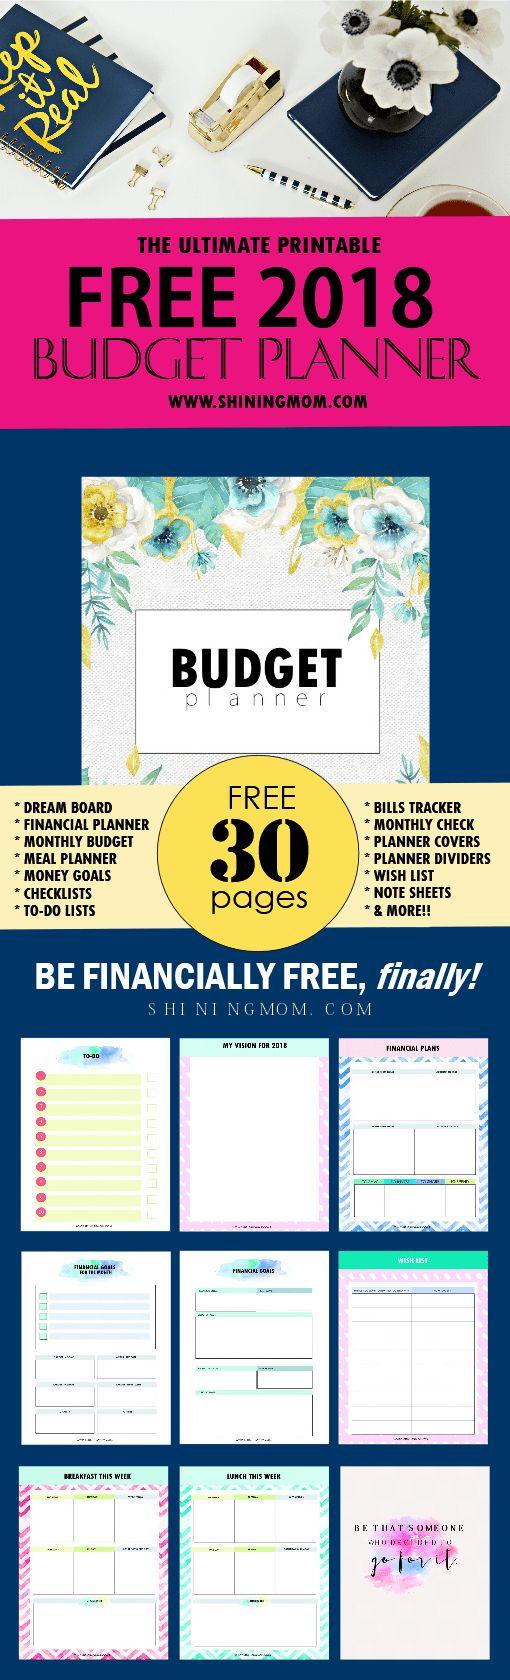 Free budget binder 2018 printable!